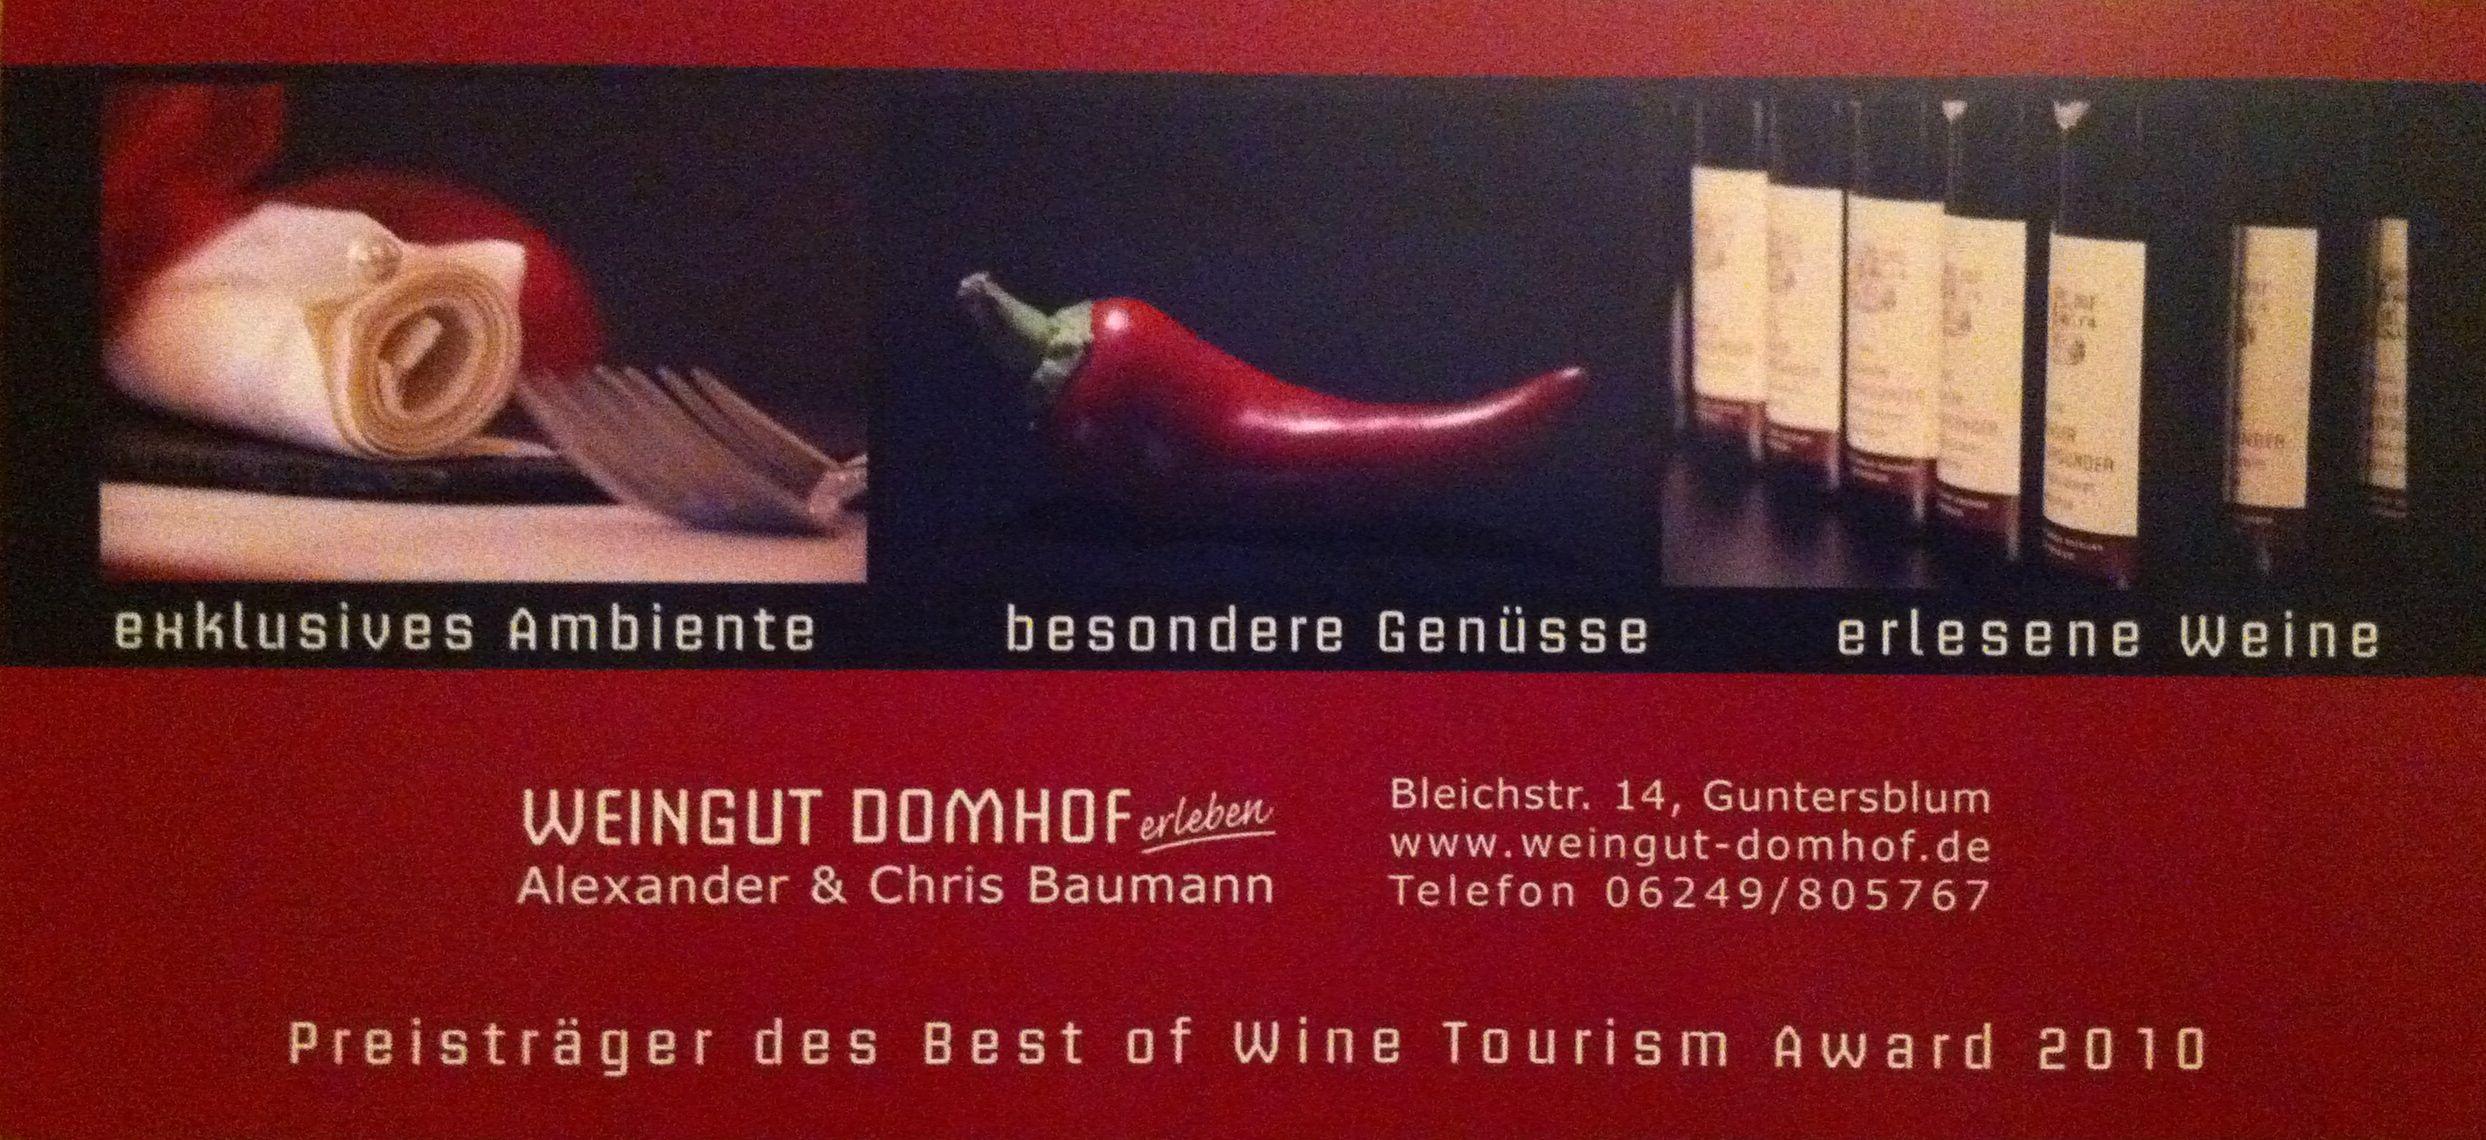 Web and Wine: Weingut Domhof